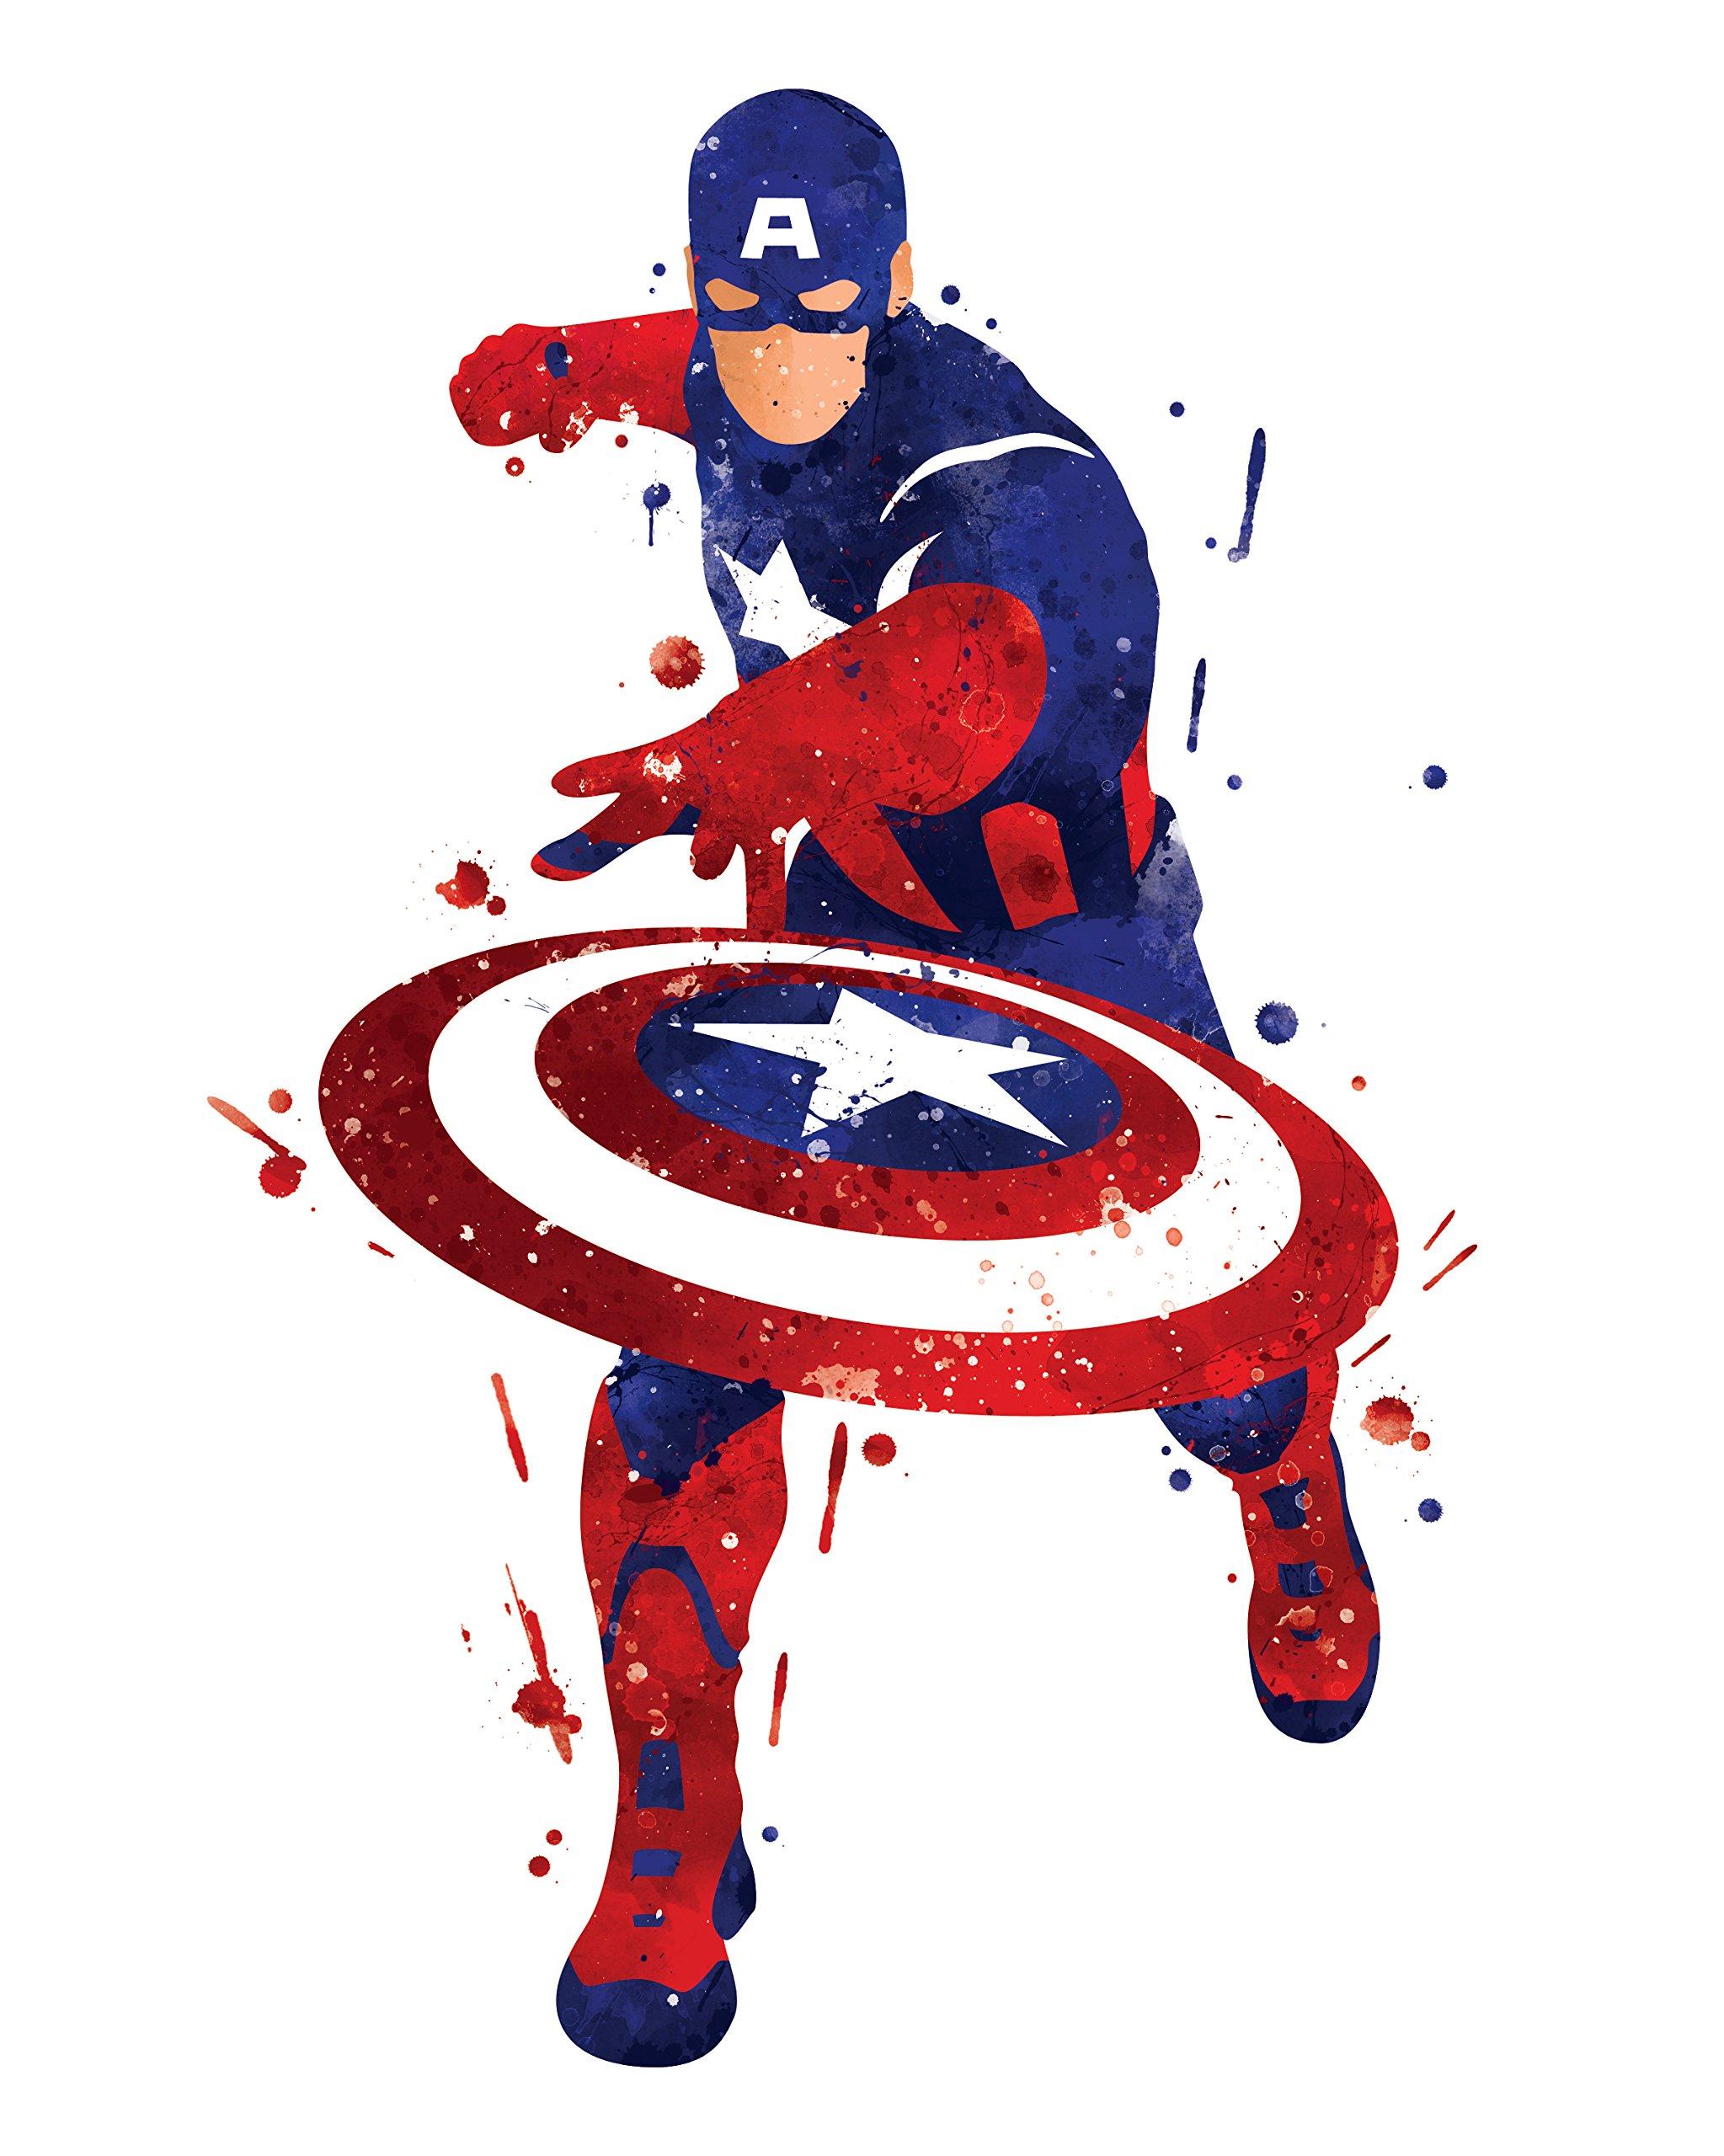 8x10 P10 Captain America poster. Inspired watercolor illustration.Avengers poster. Superhero poster. Wall art.Art print.Wall decor.Captain America pictures.Kids room wall art.for wall.